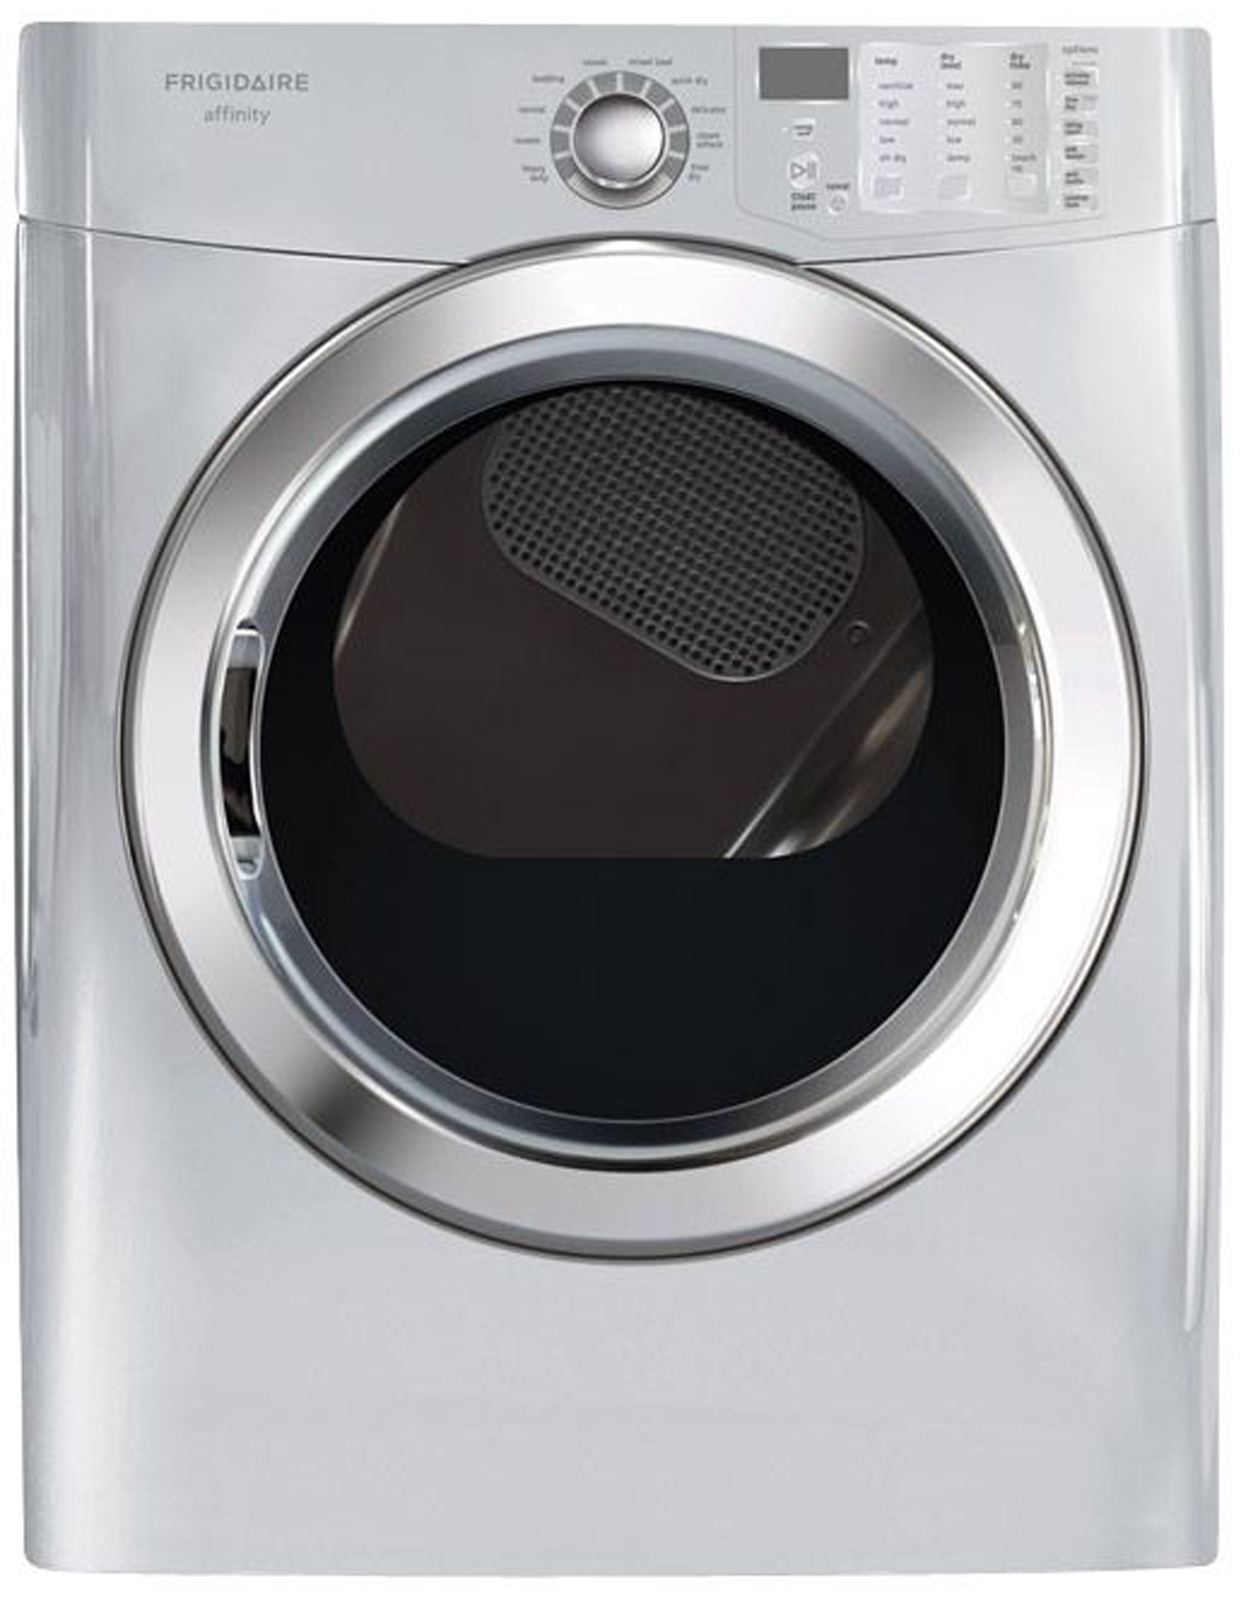 Frigidaire Affinity Parts Diagram House Wiring Symbols Clothes Dryer Circuit U2022 Rh Ericruizgarcia Co Manual